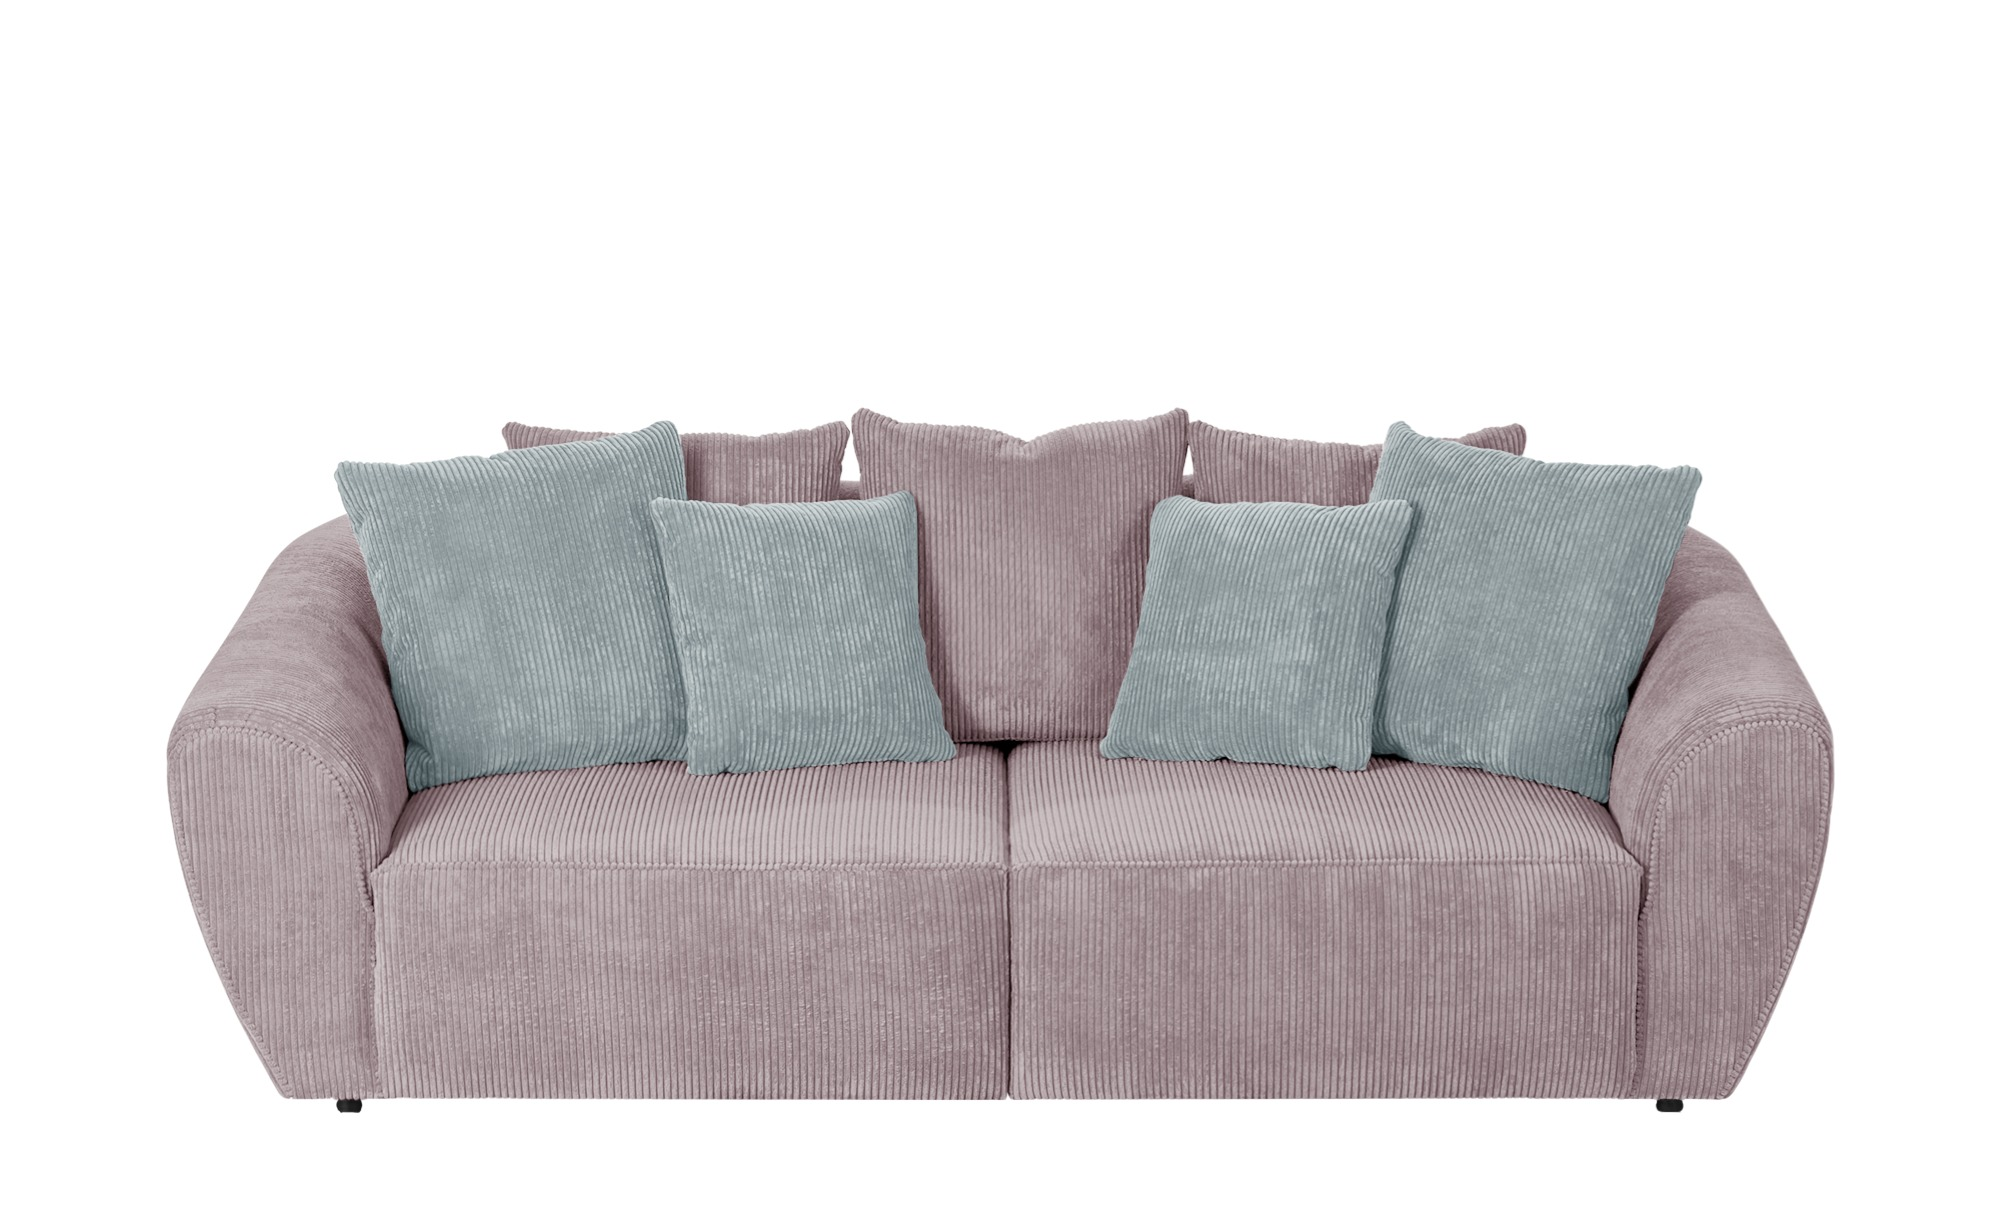 Full Size of Höffner Big Sofa Smart Savita Altrosa Günstig Günstige Eck Led U Form Langes Günstiges Lila Delife Heimkino Sofa Höffner Big Sofa